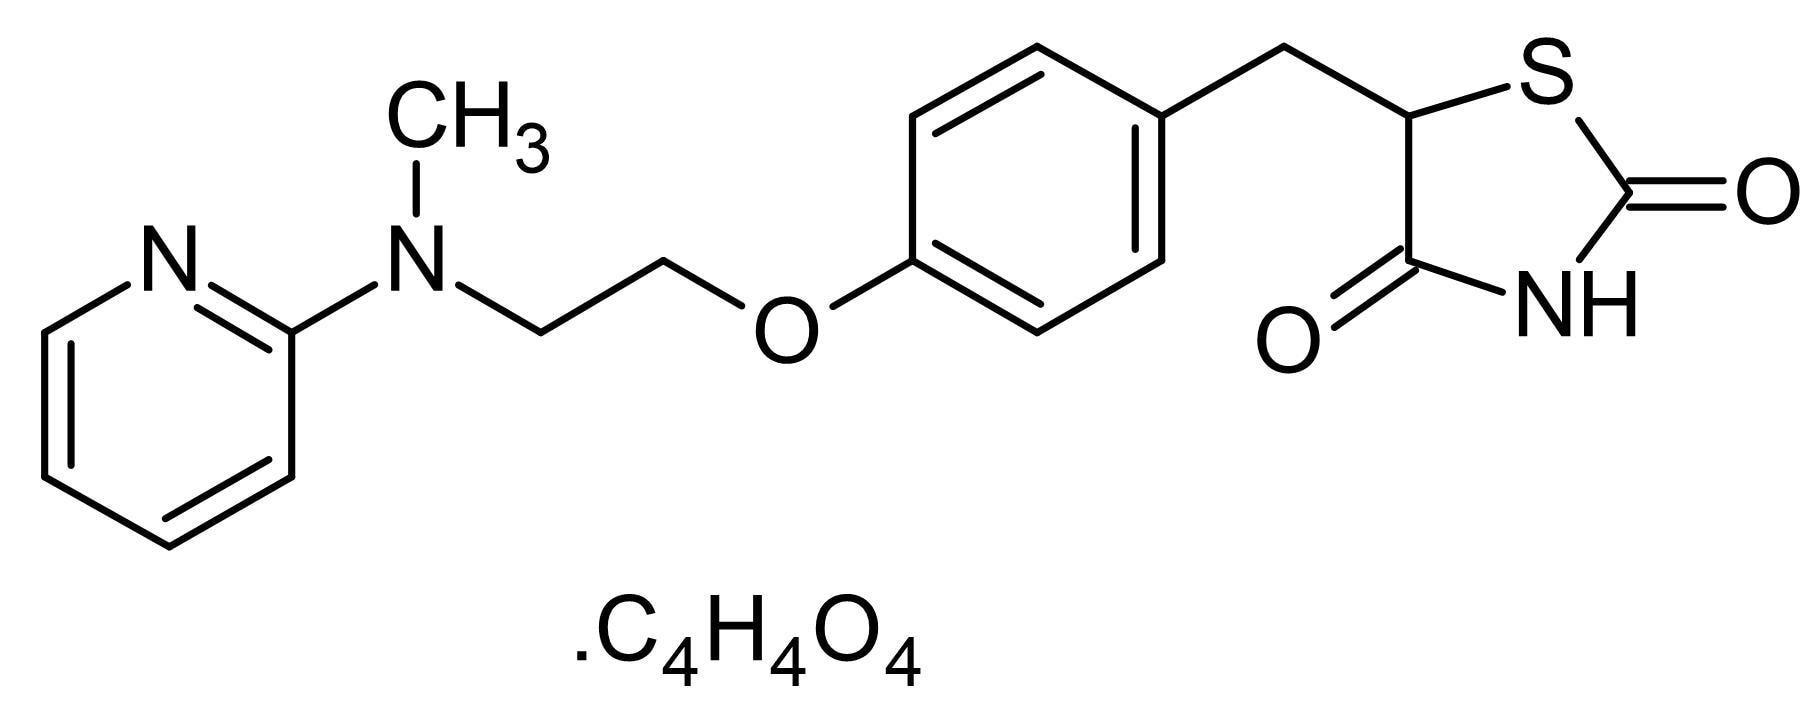 Chemical Structure - Rosiglitazone maleate (Avandia), PPARgamma agonist. Maleate salt. (ab142461)